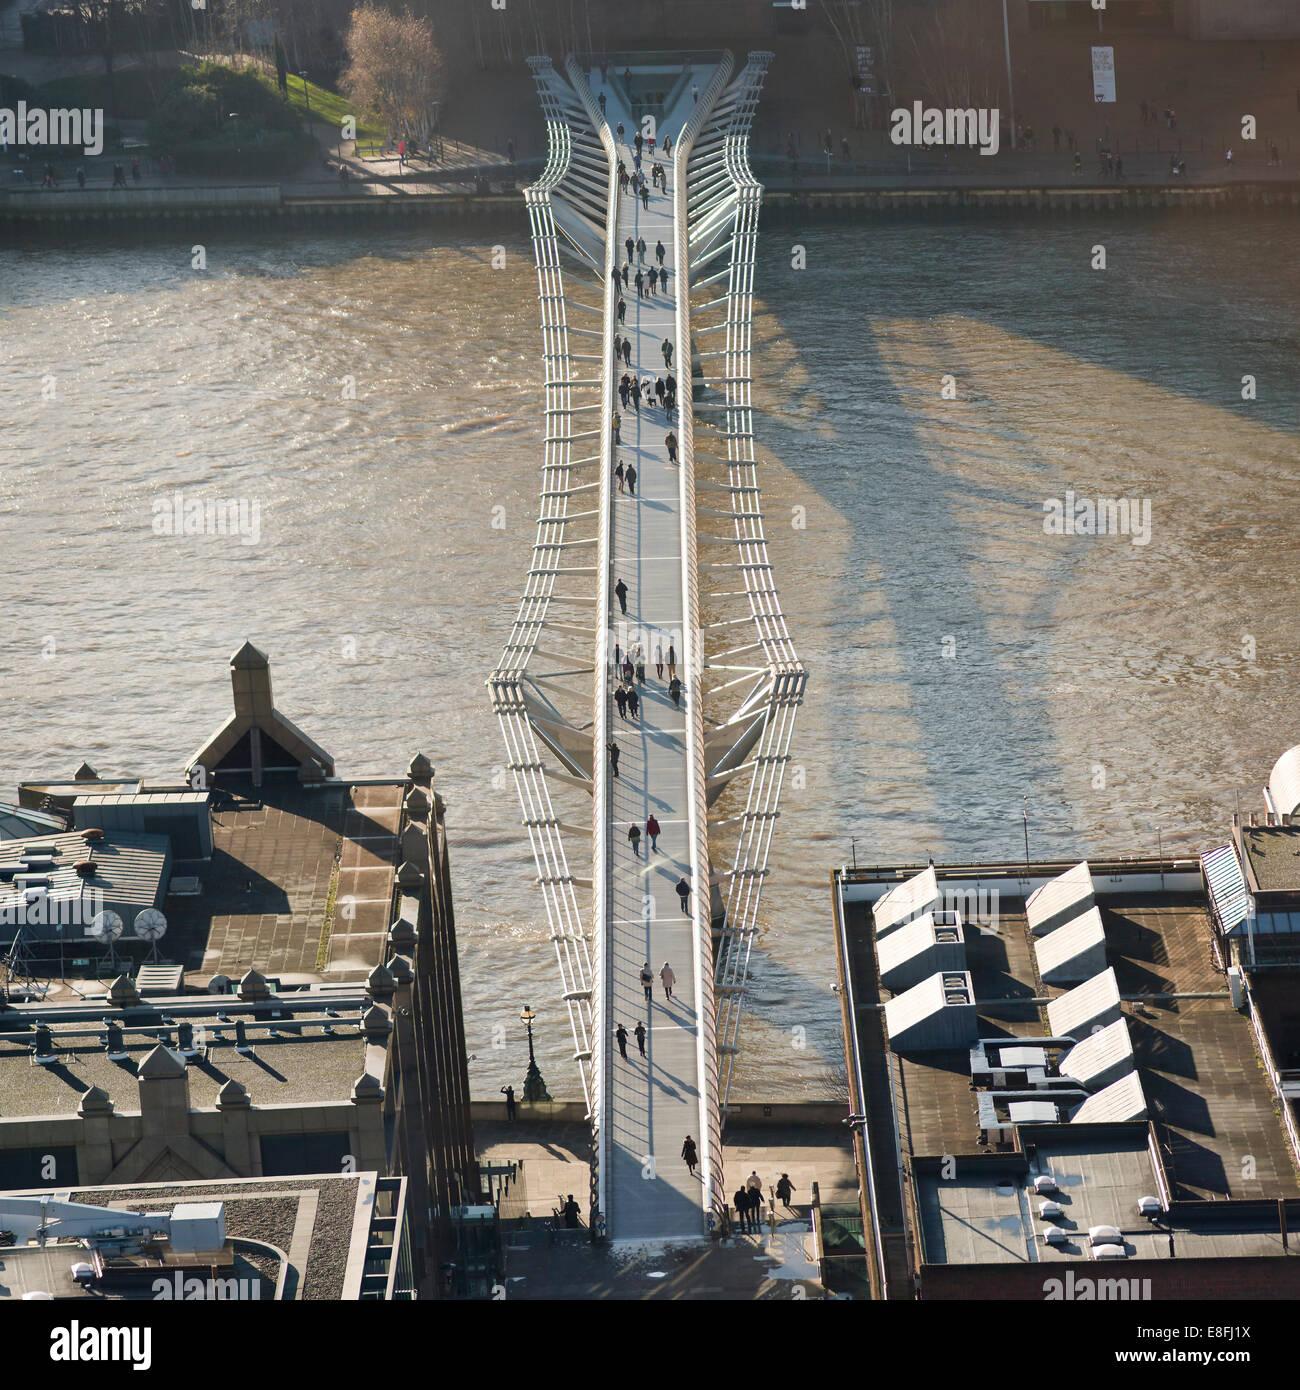 Aerial view of Millennium Bridge, London, England, UK - Stock Image